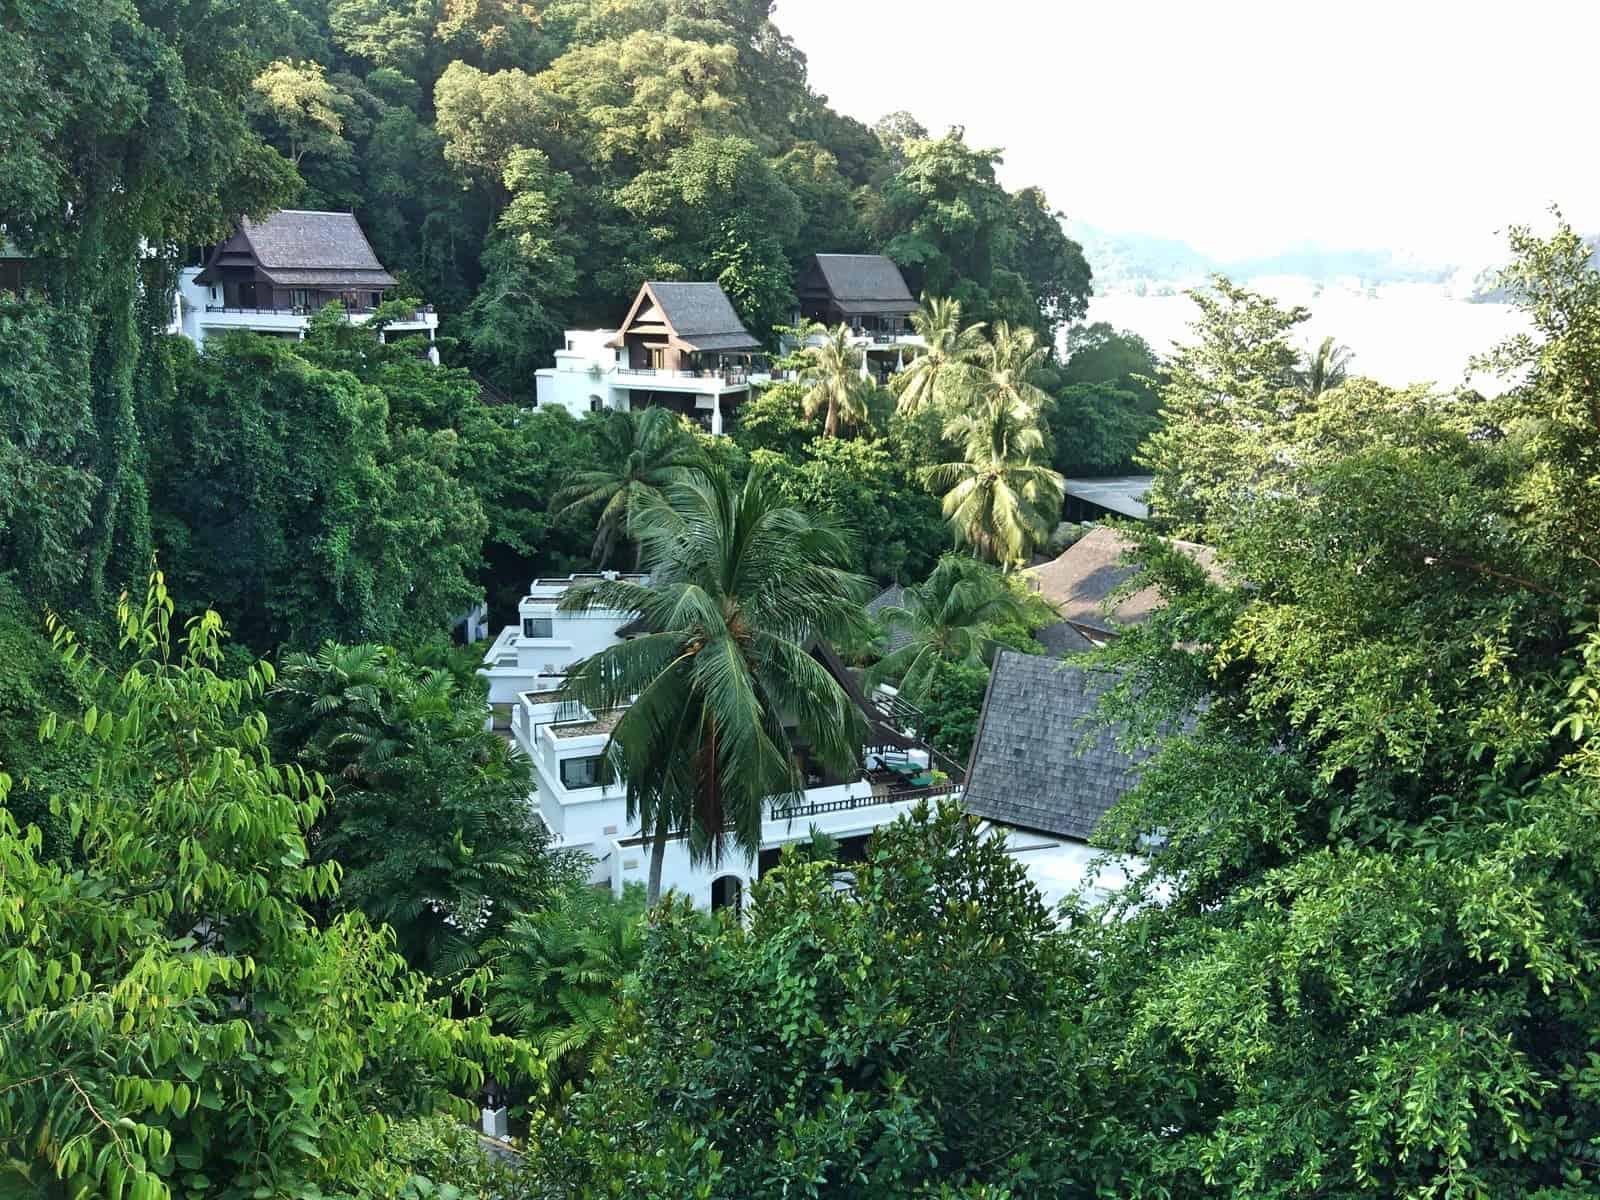 Pangkor-Laut-Resort-island-Malaysia-Travel-Mermaid